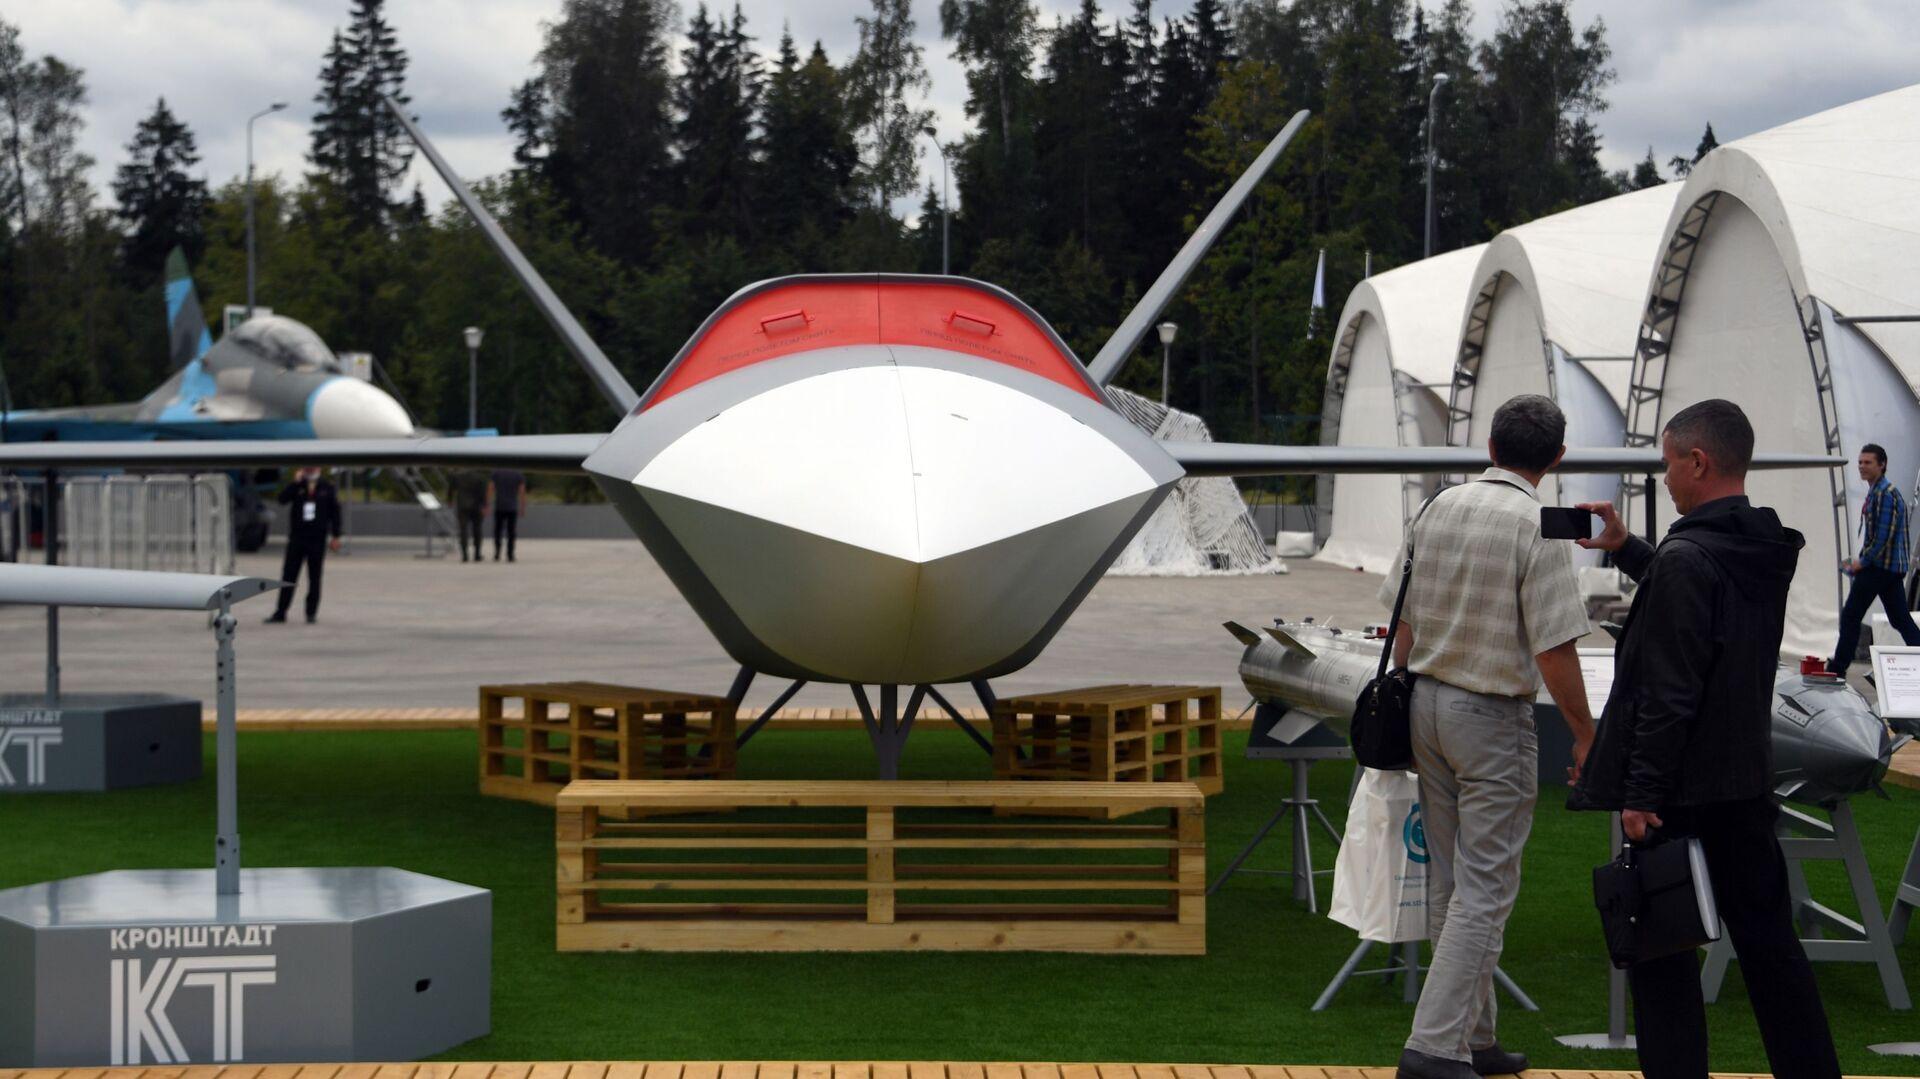 Il drone russo Grom - Sputnik Italia, 1920, 02.09.2021